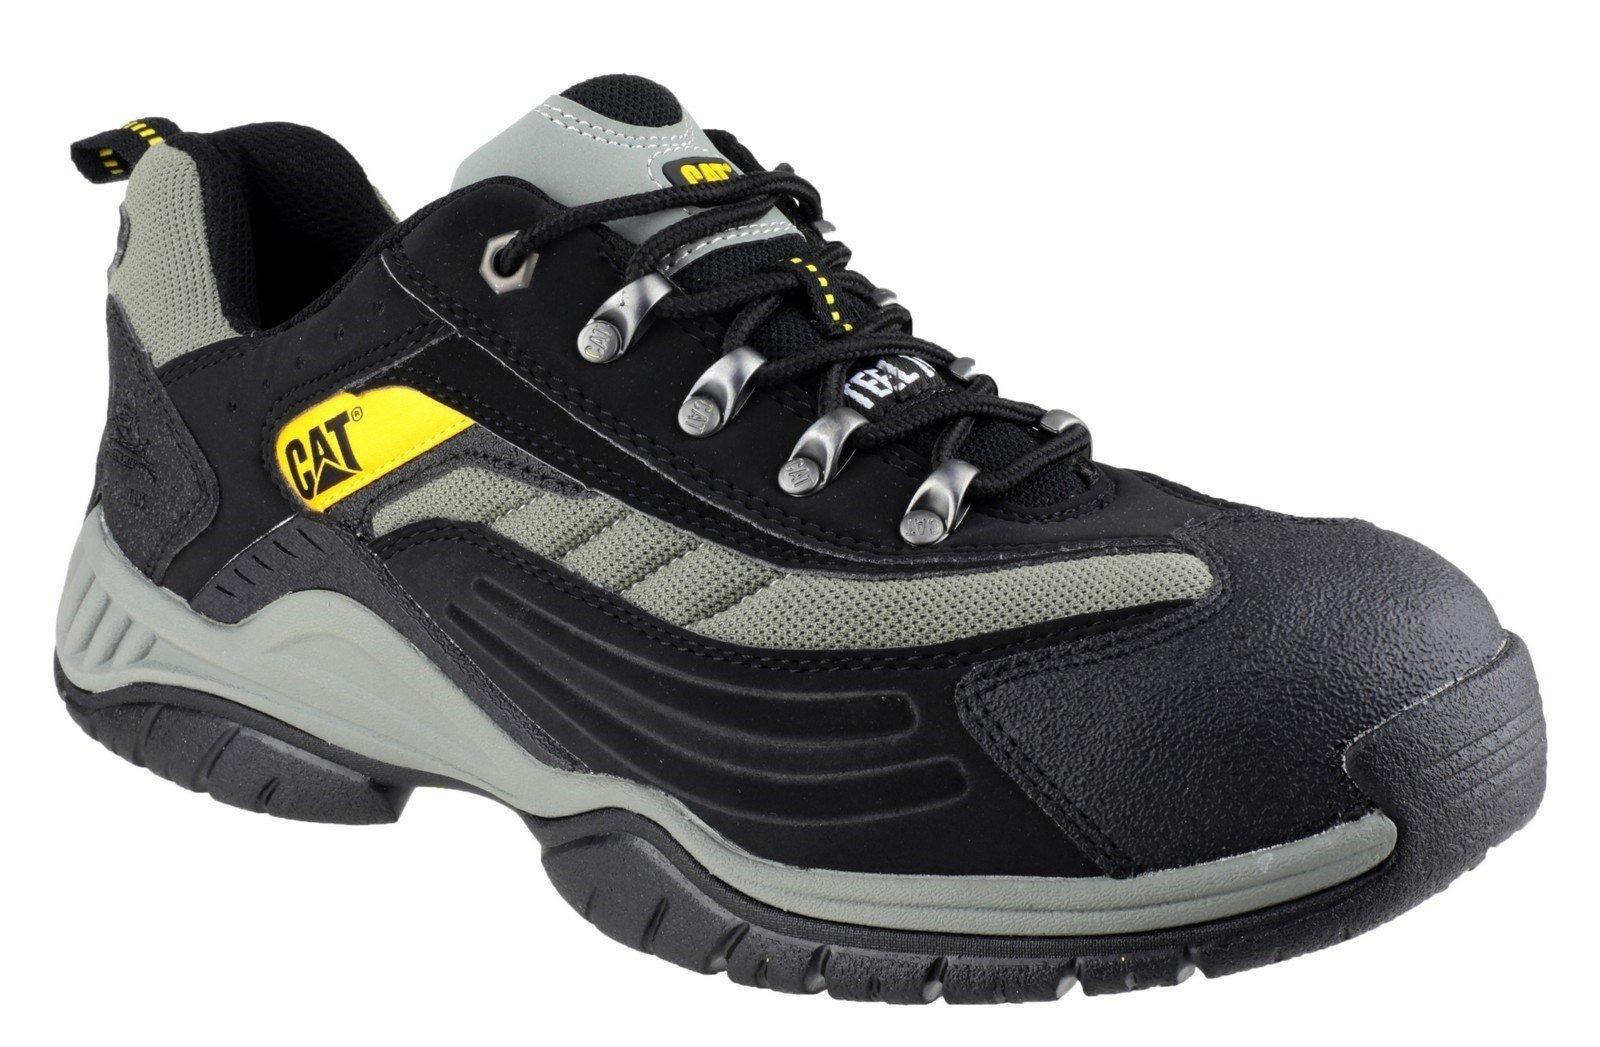 Caterpillar Men's Moor Safety Trainer Black 10928 - Black 6